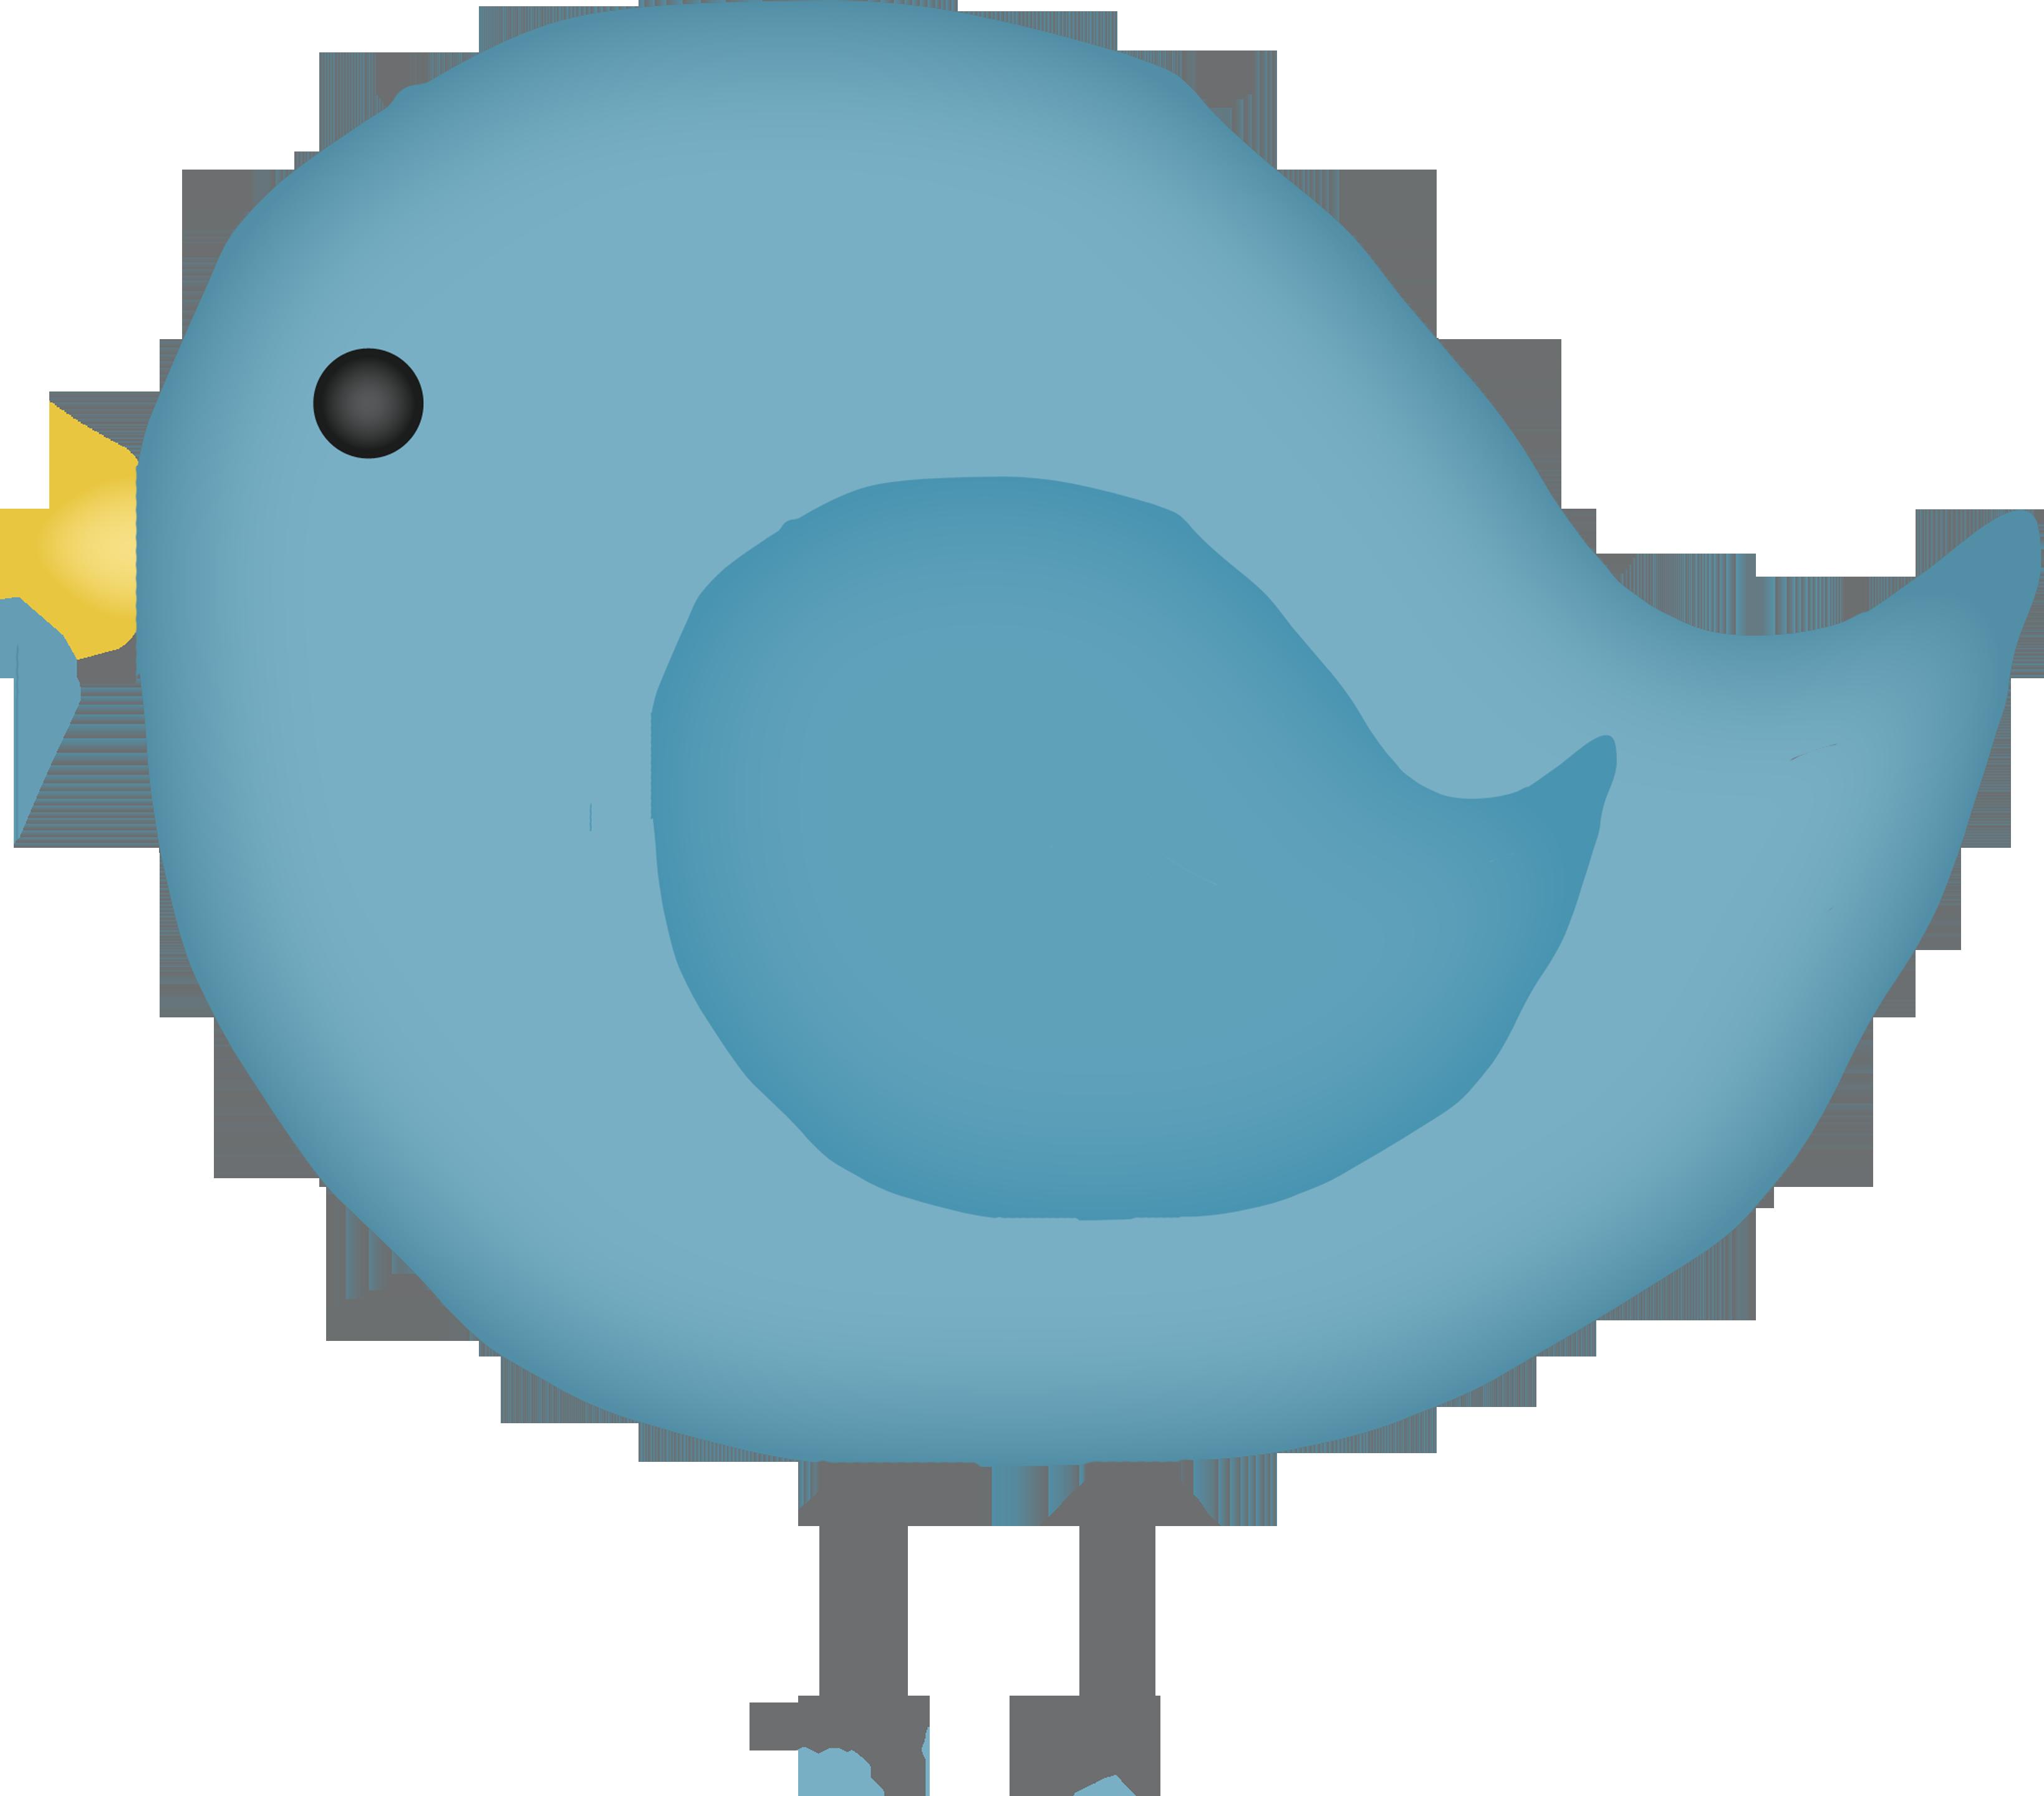 Spring bluebird clipart banner freeuse stock Free Bluebird Clipart, Download Free Clip Art, Free Clip Art ... banner freeuse stock